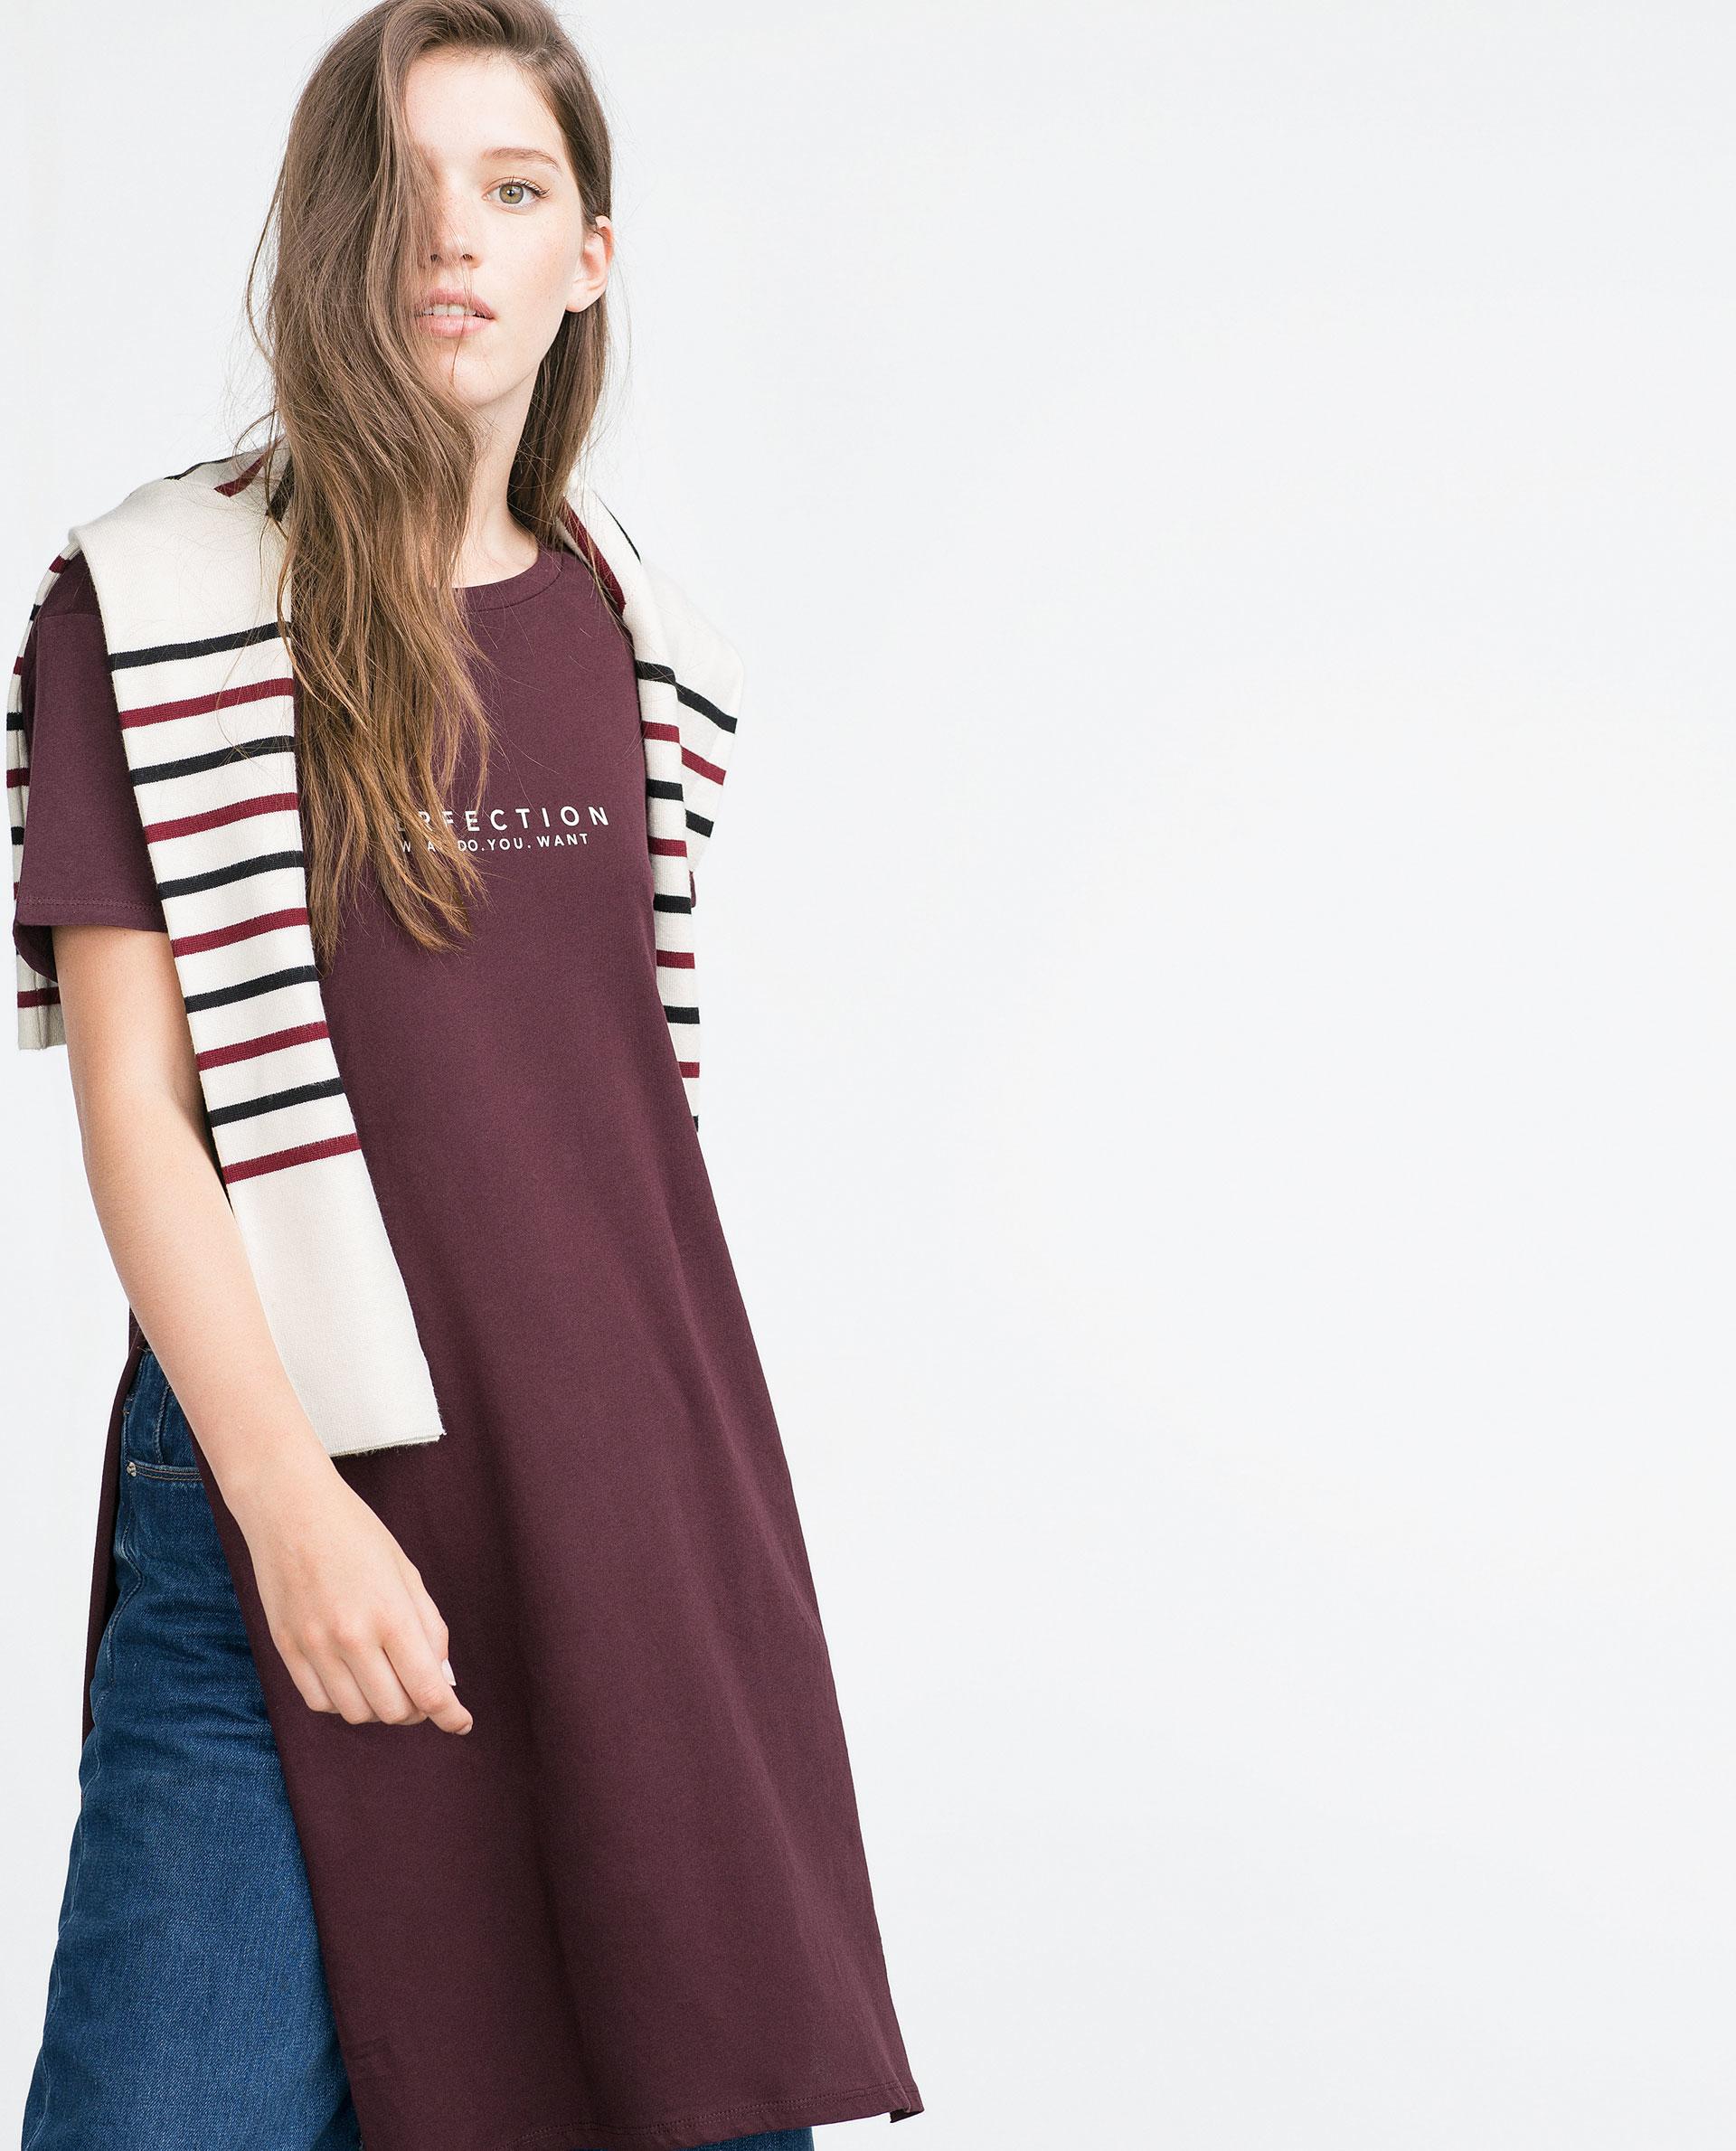 Zara long text t shirt in purple burgundy lyst for Zara black t shirt dress